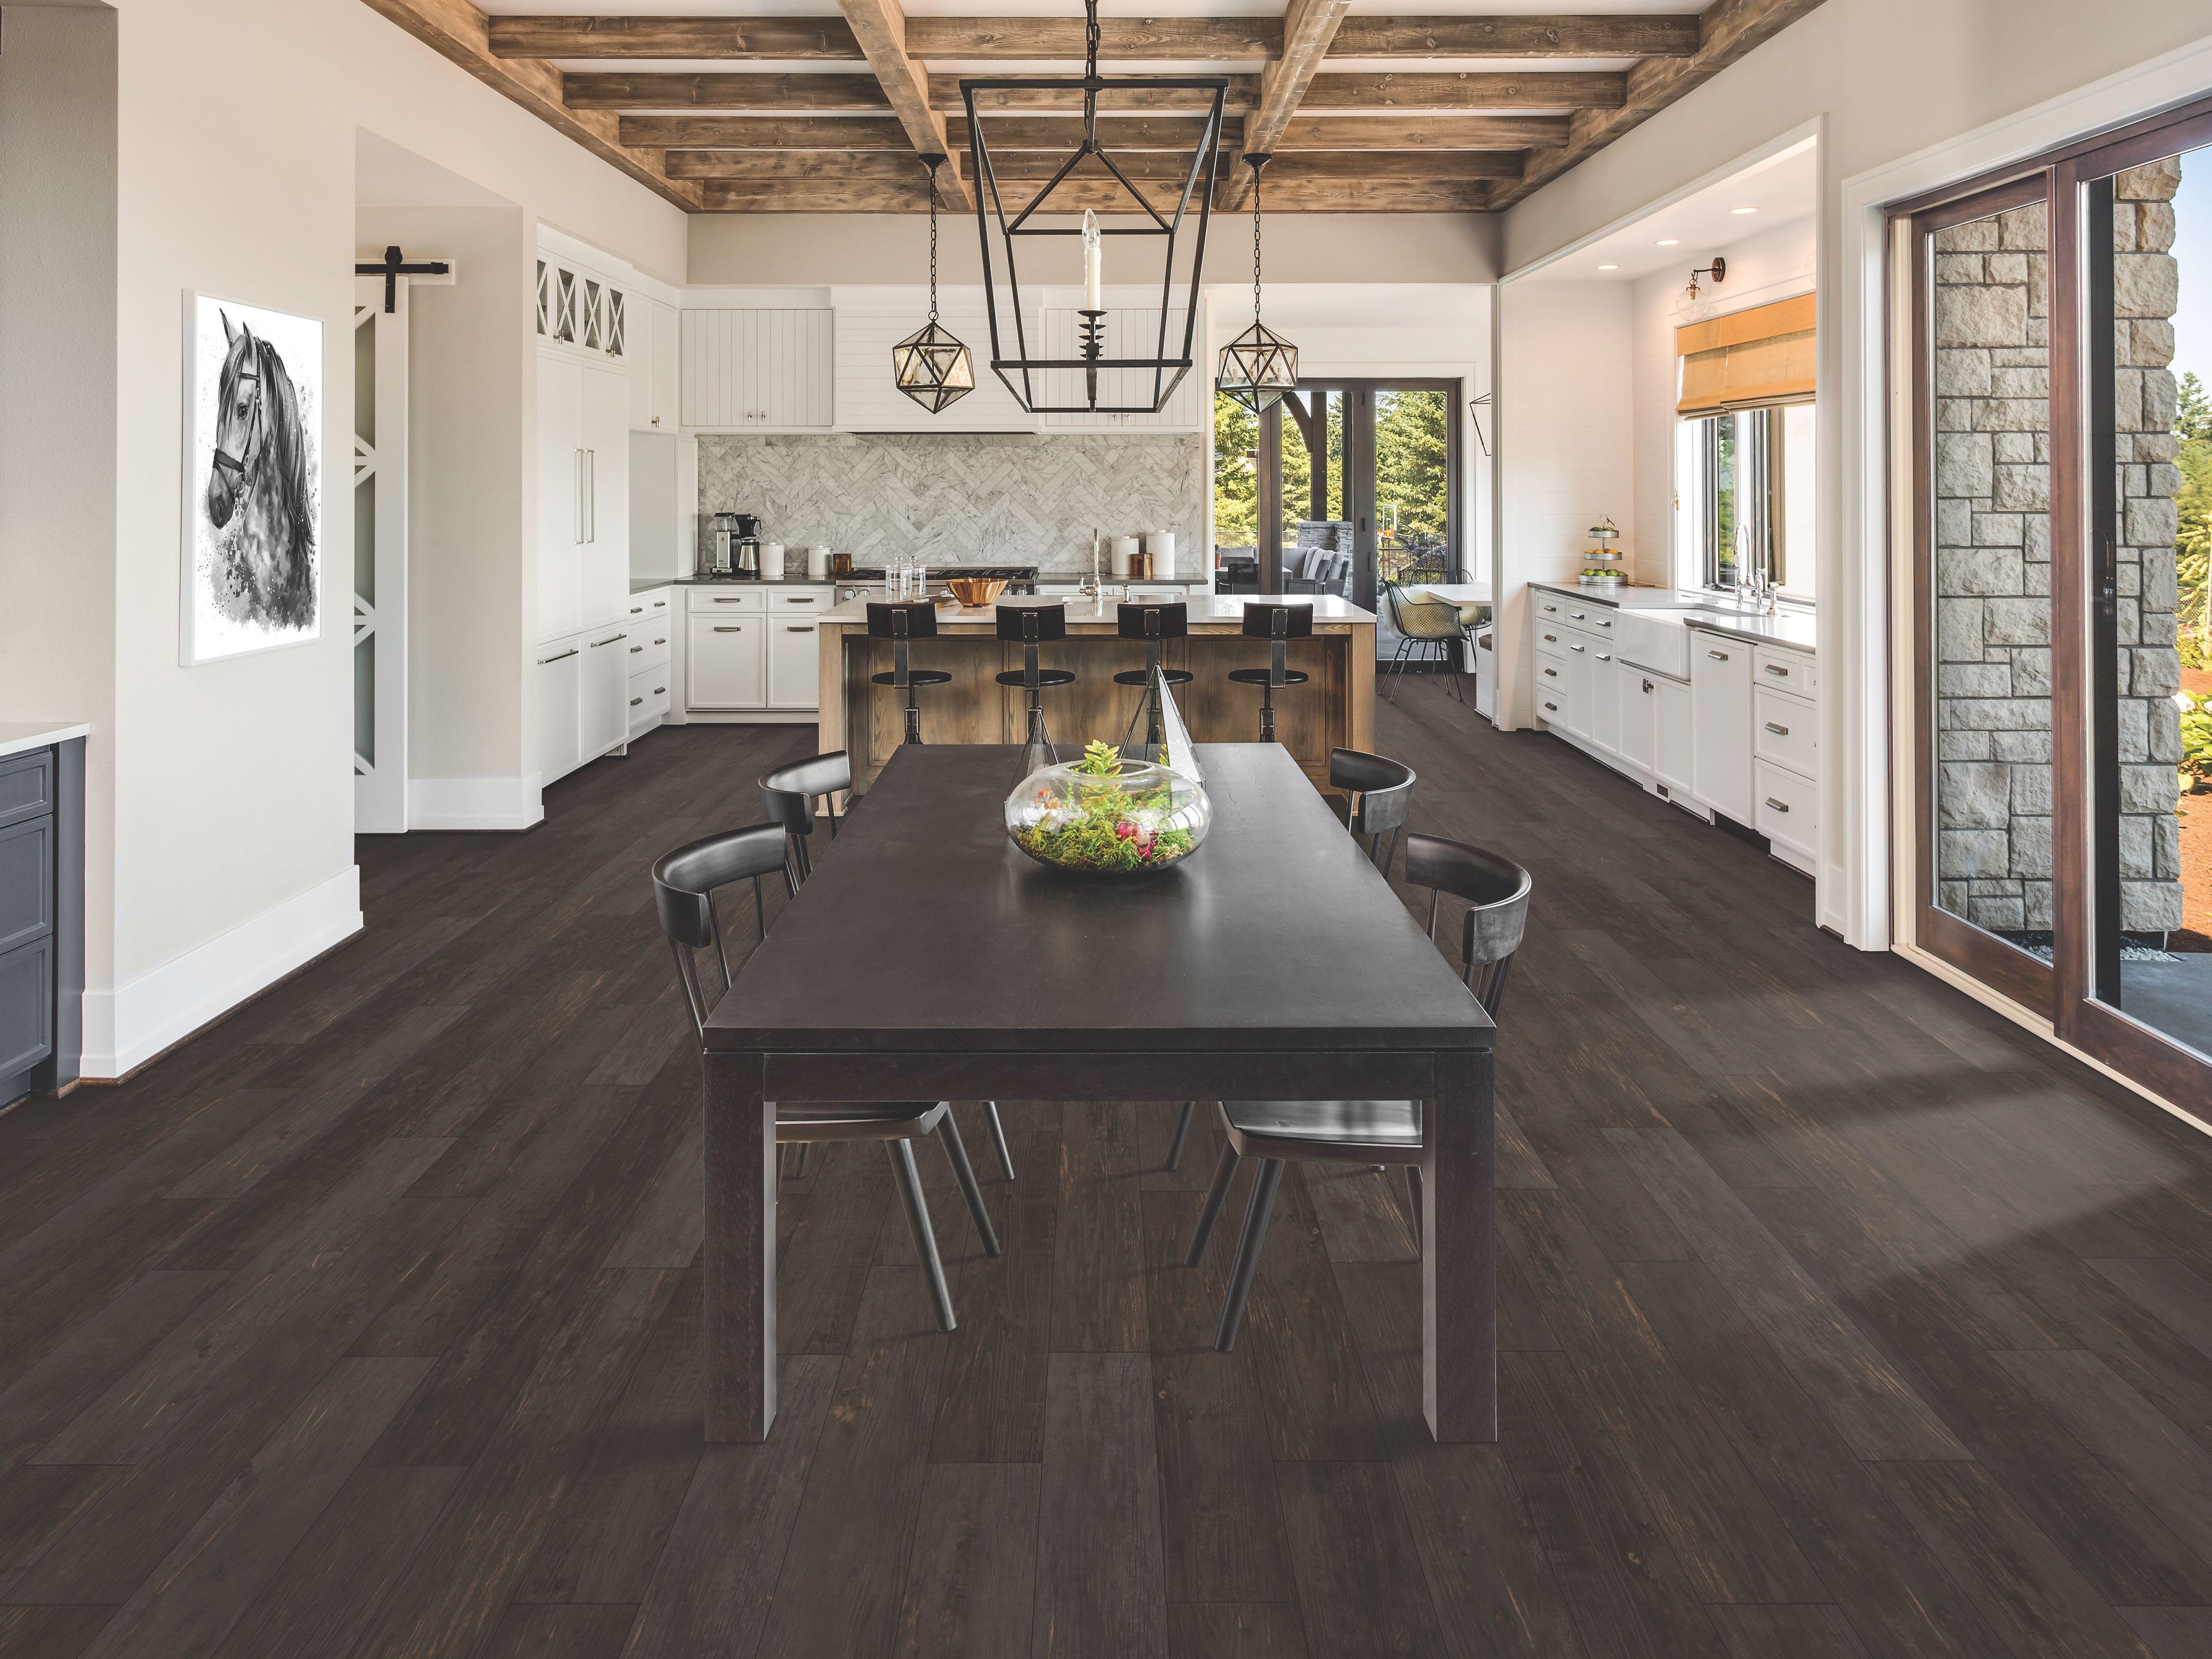 Omaha, NE kitchen with dark tone waterproof flooring